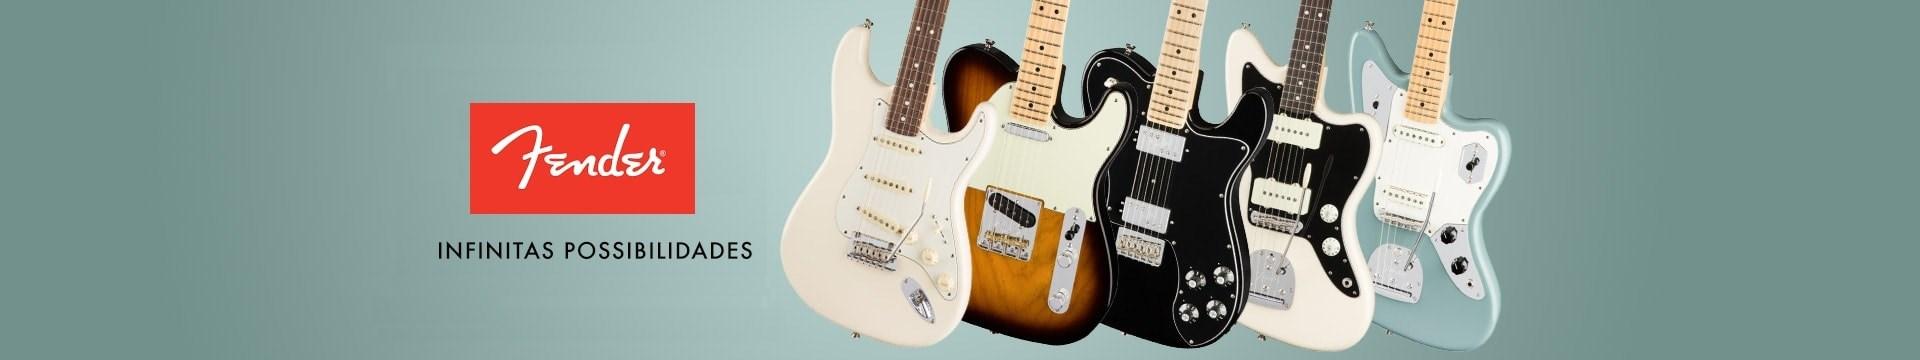 Fender (Marca)